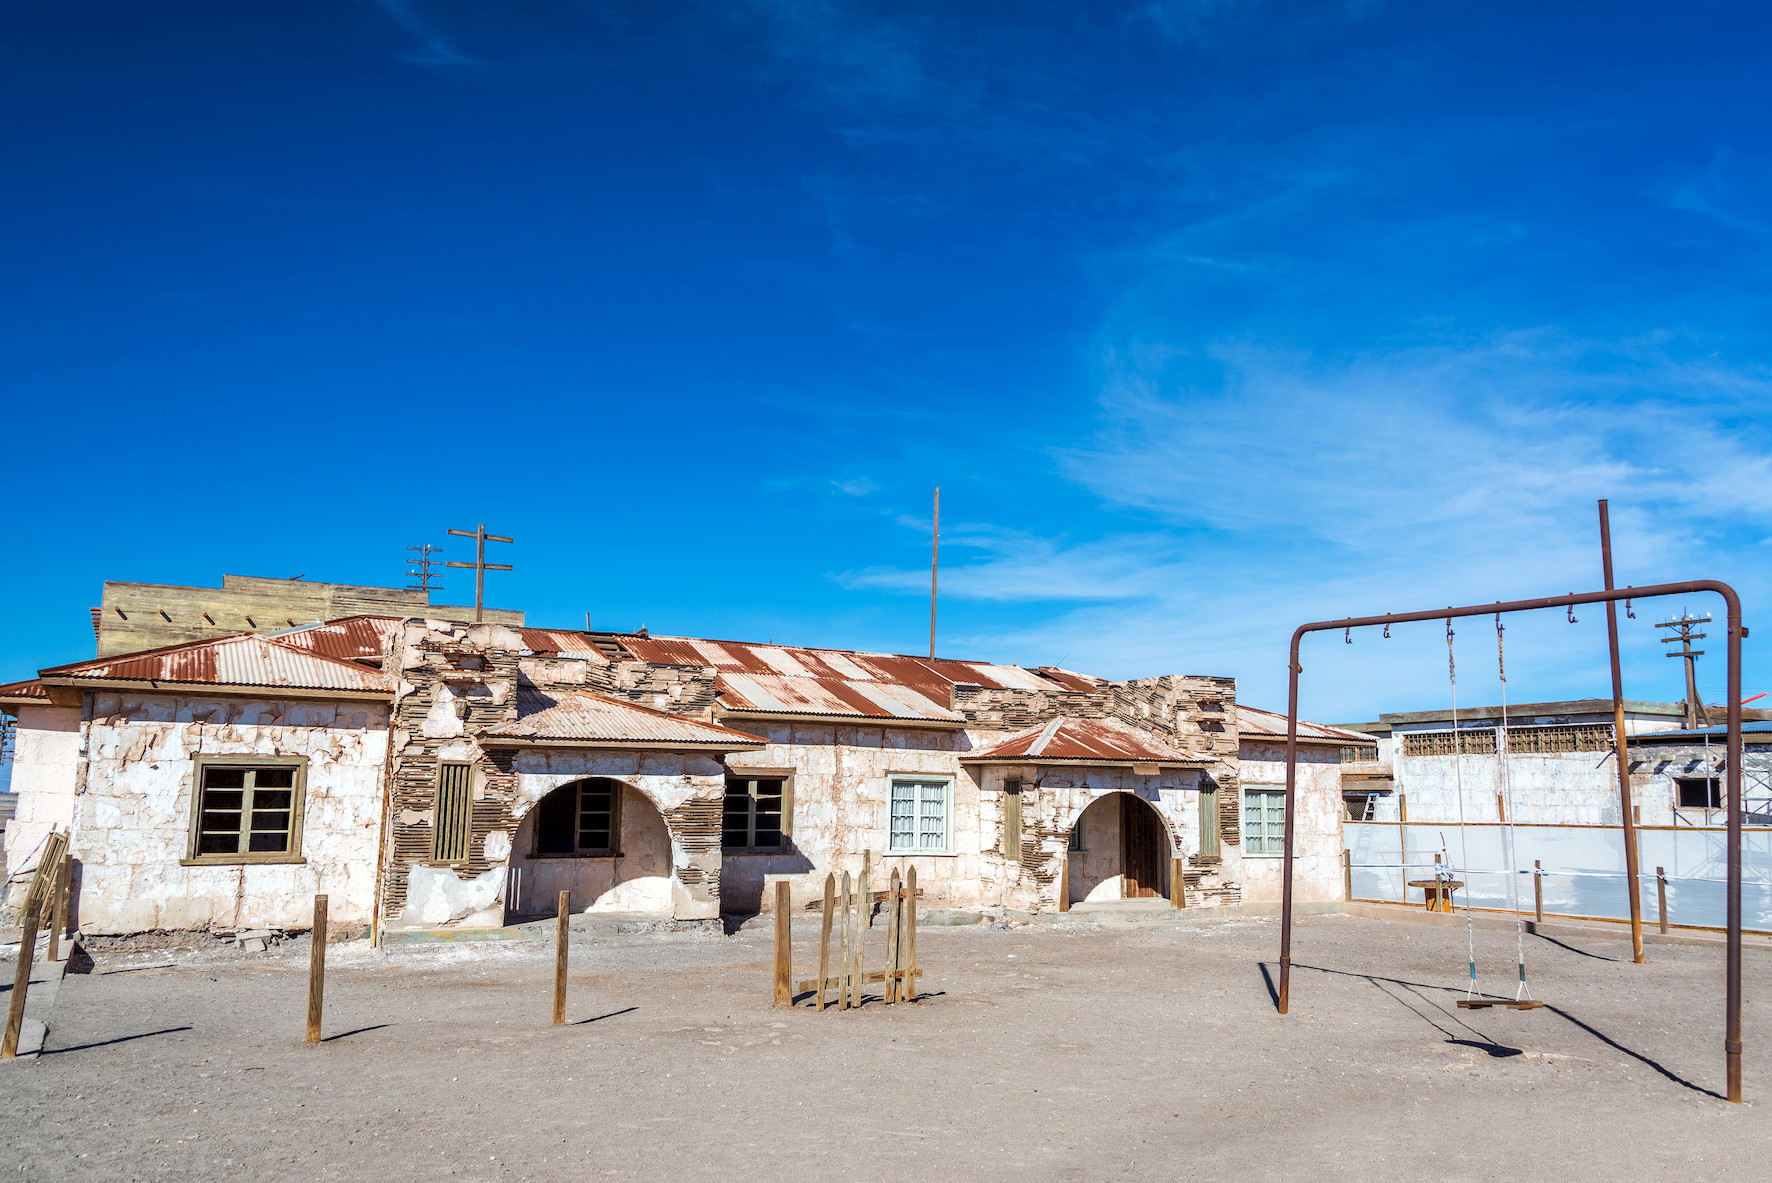 ciudad fantasma humberstone santa laura. Humberstone y Santa Laura, Chile